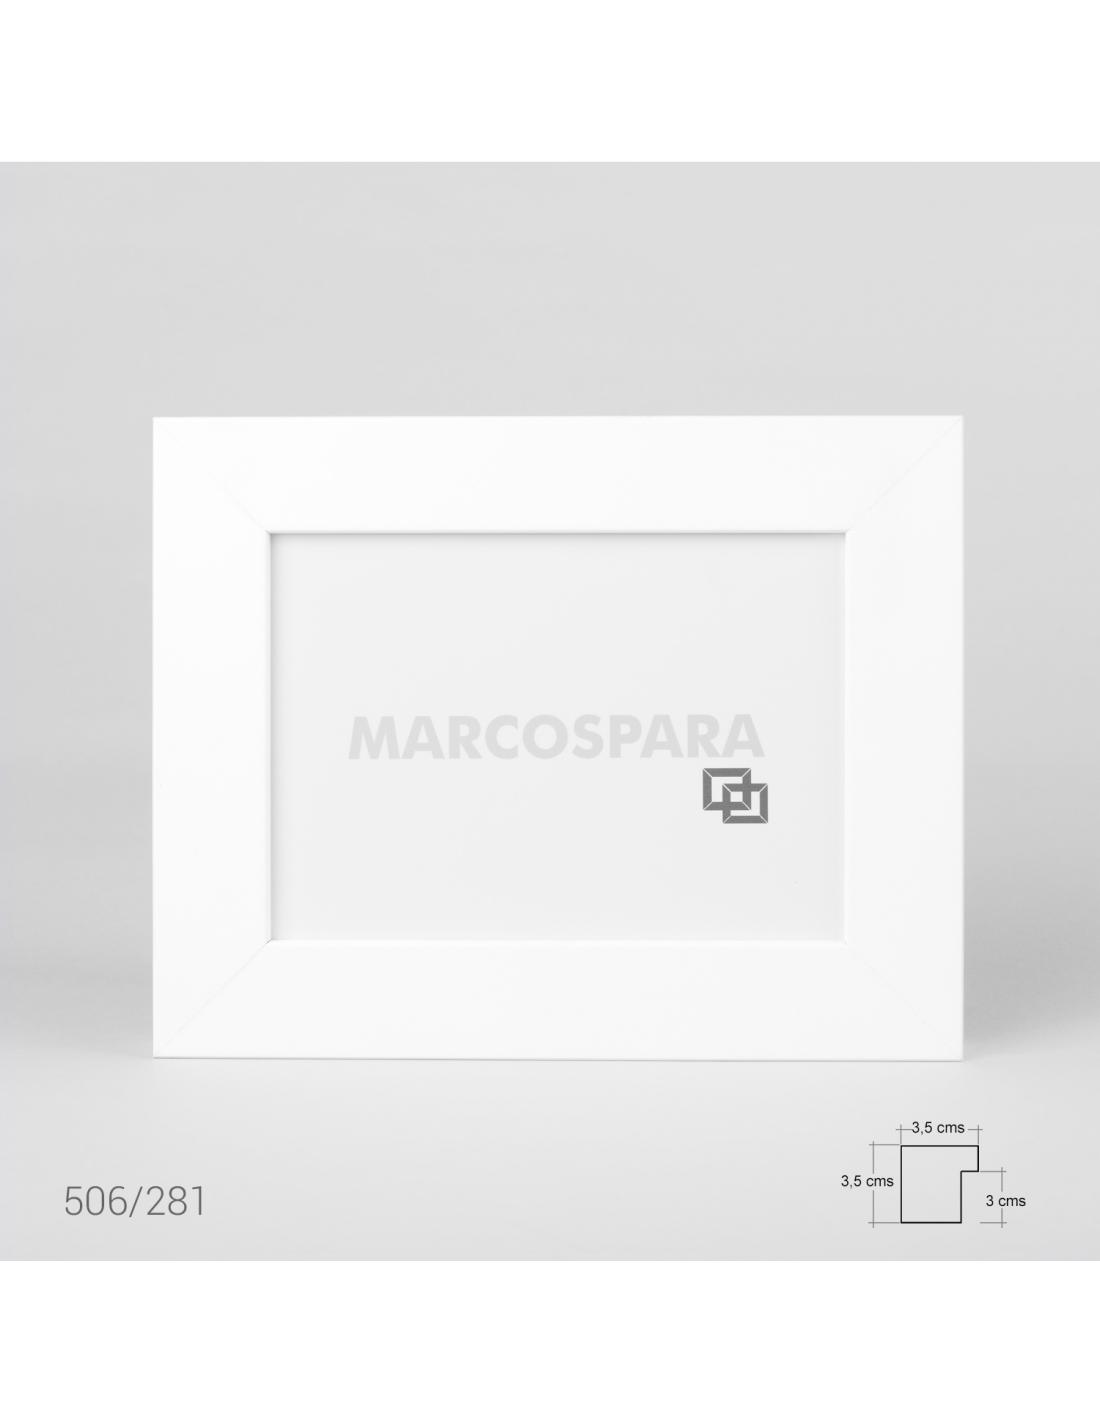 Marcos de madera para Puzzles M506